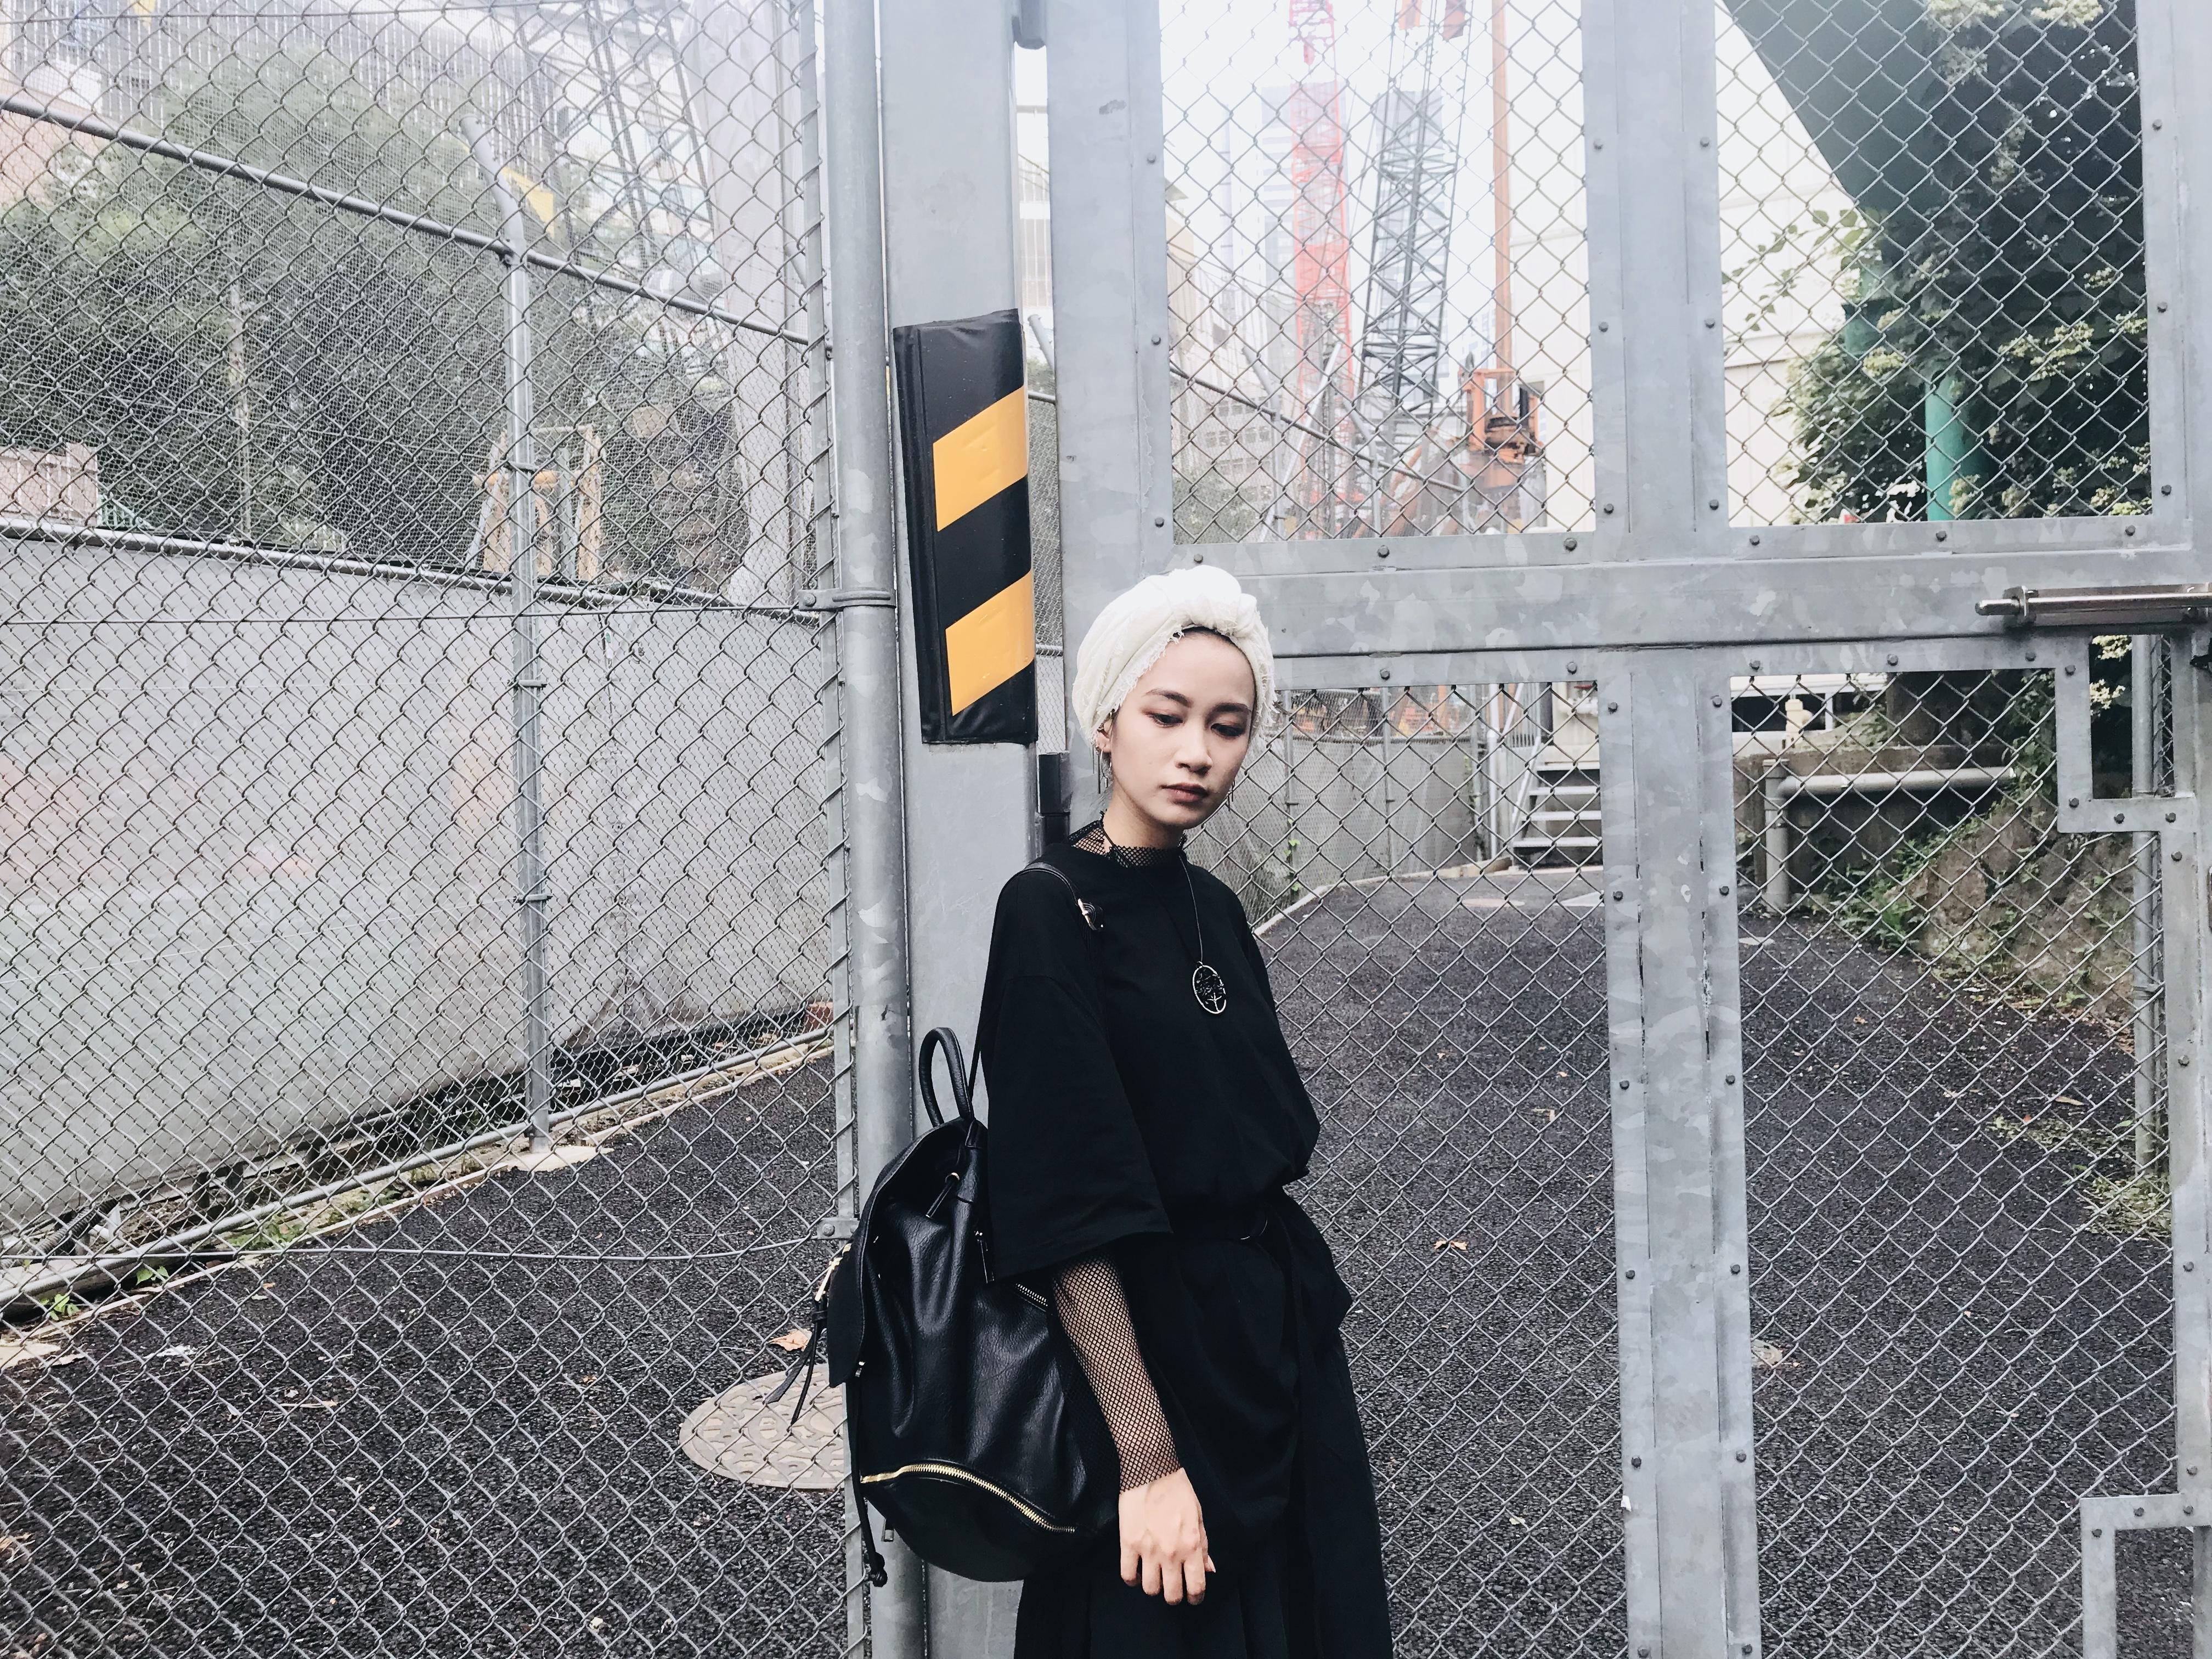 Tokyo, Japan, July 2018